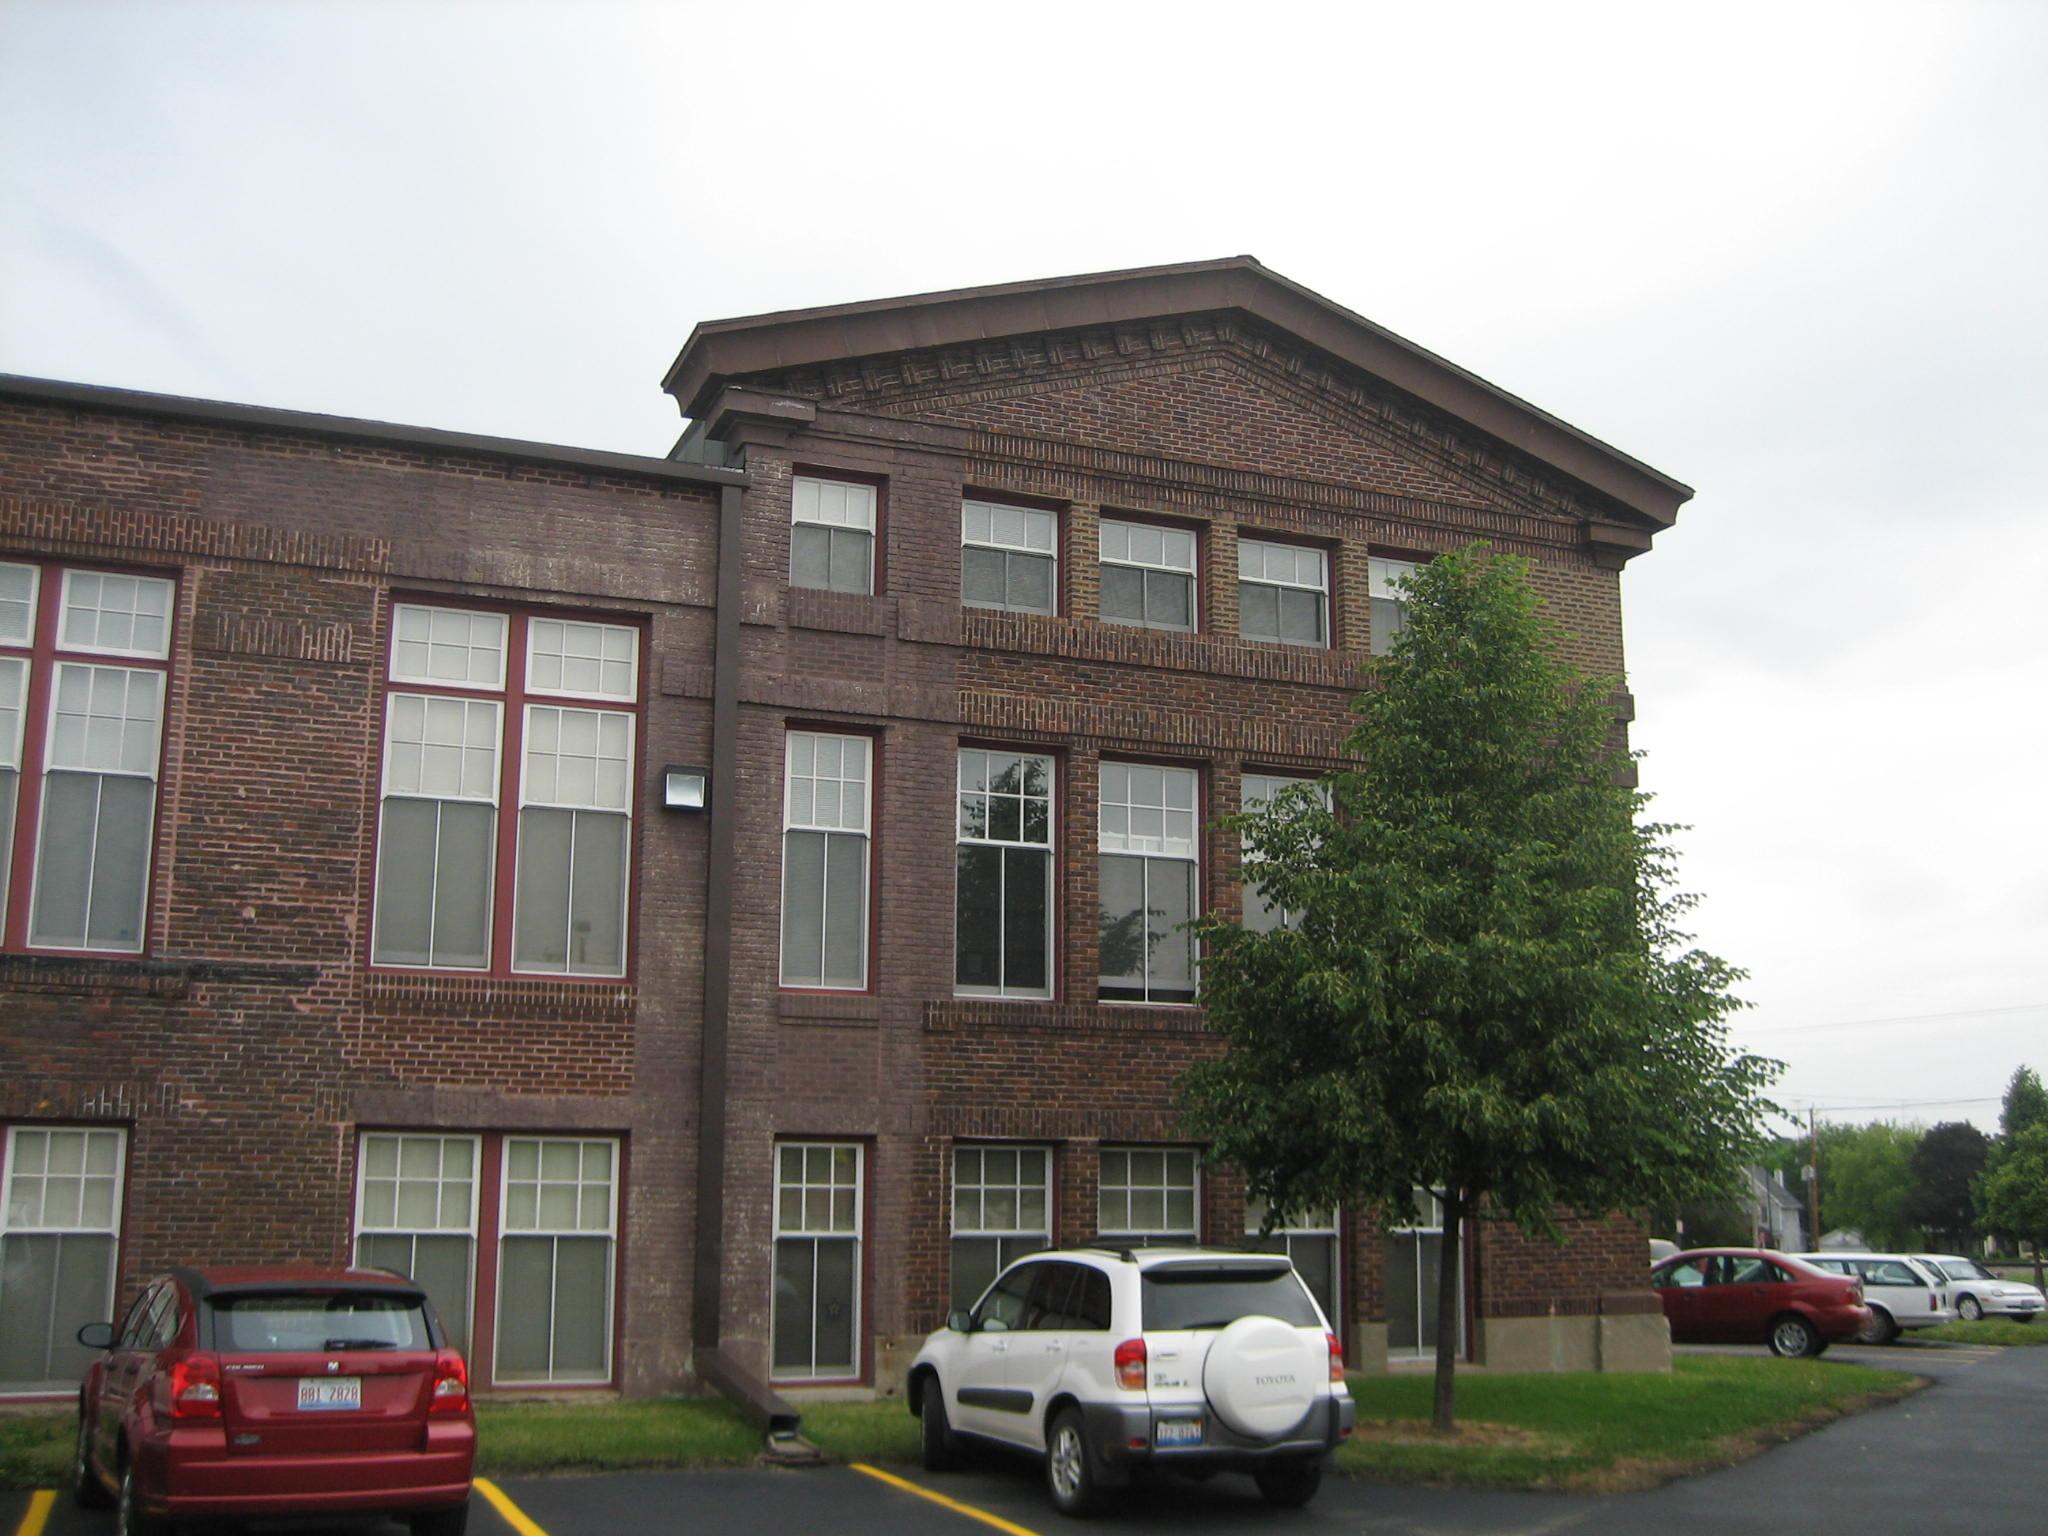 Old Belvidere High School (Belvidere